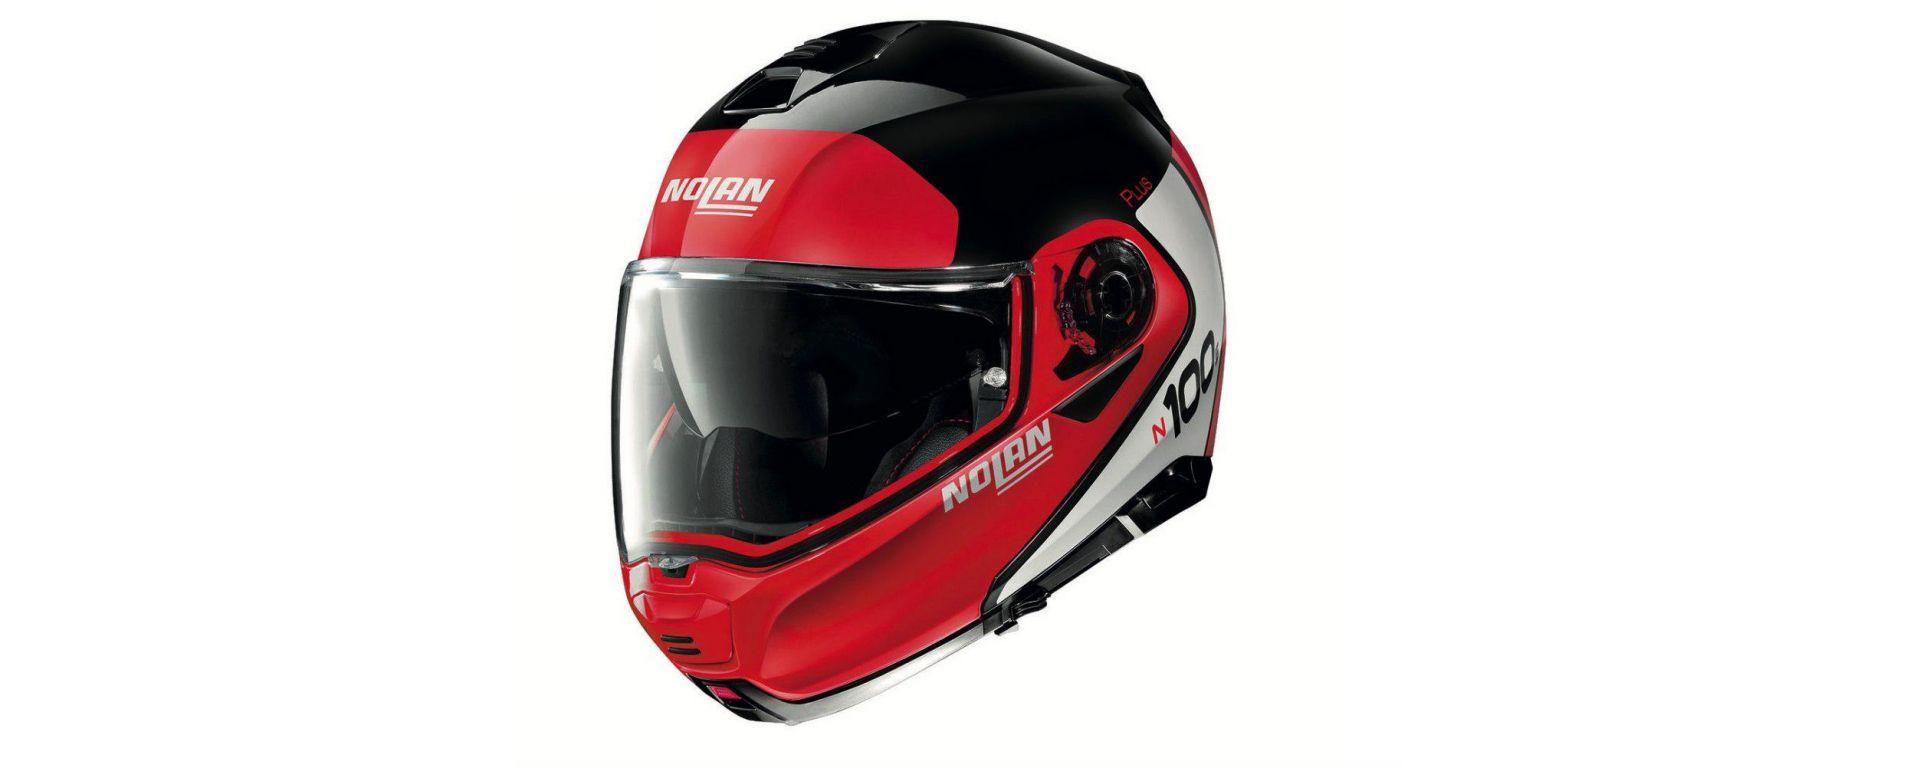 Il nuovo casco Nolan N 100-5 PLUS